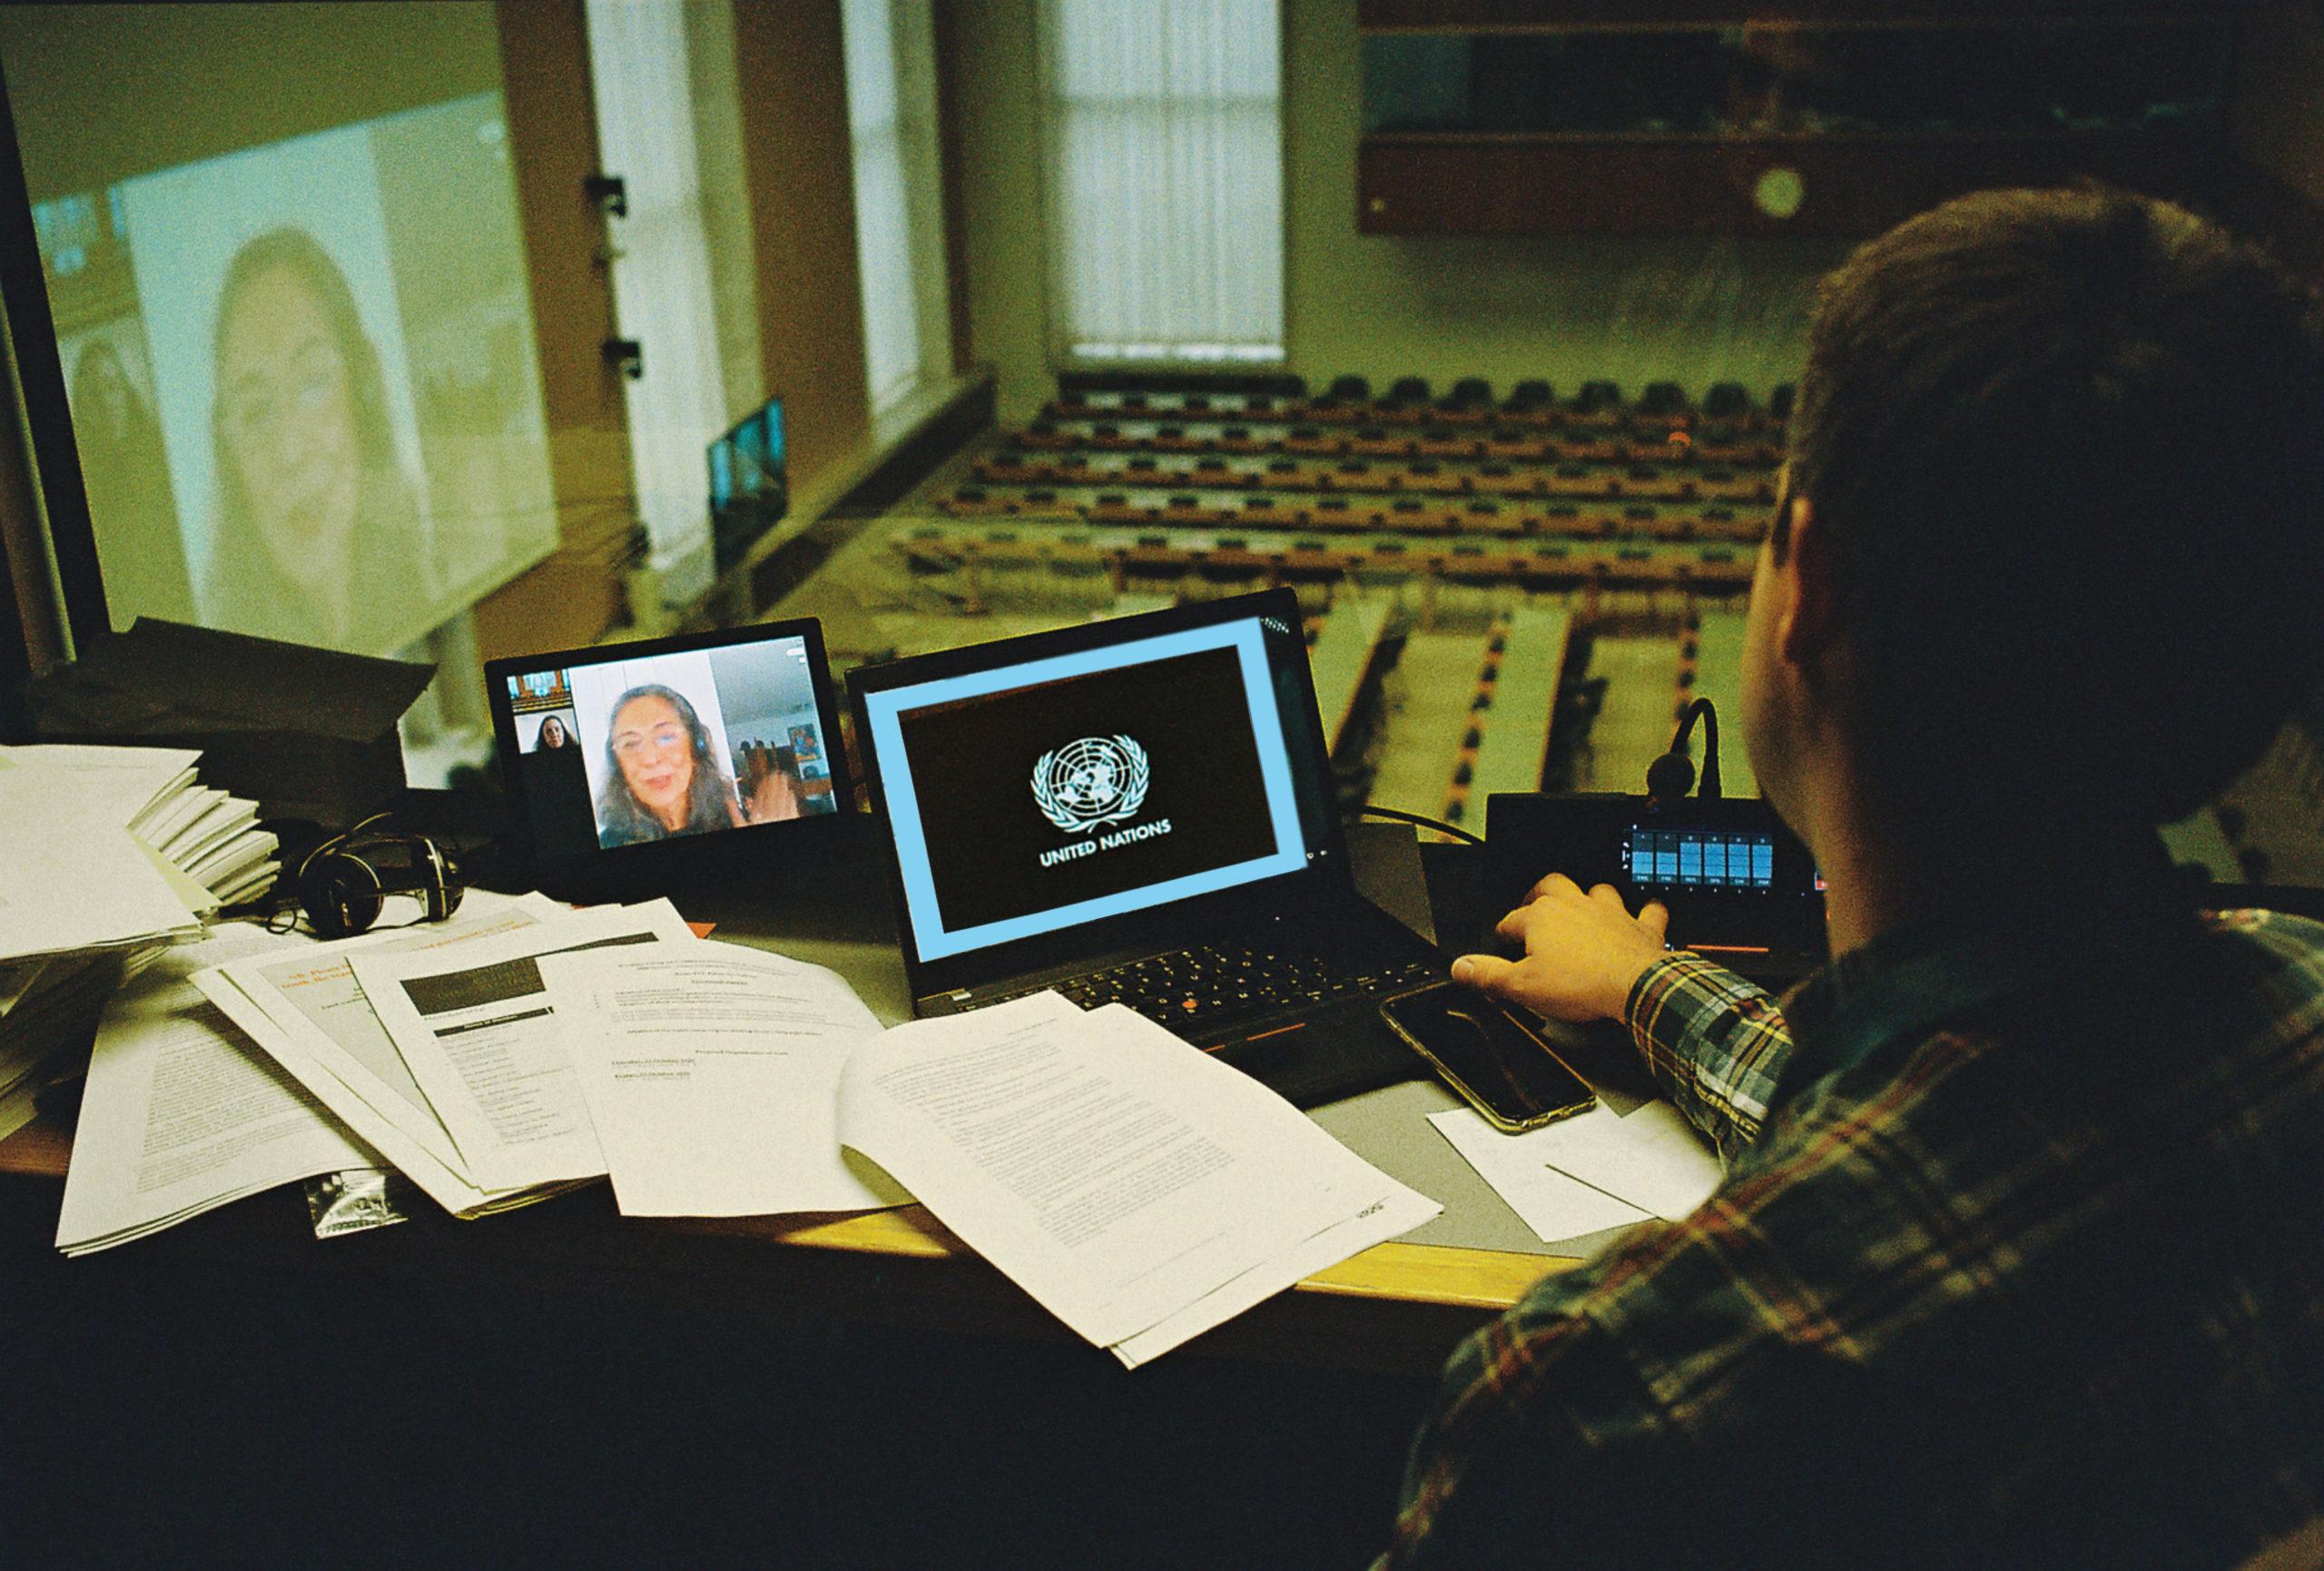 RSI in Room XVI. Palais des Nations (United Nations Office at Geneva) © Daniel Harrison